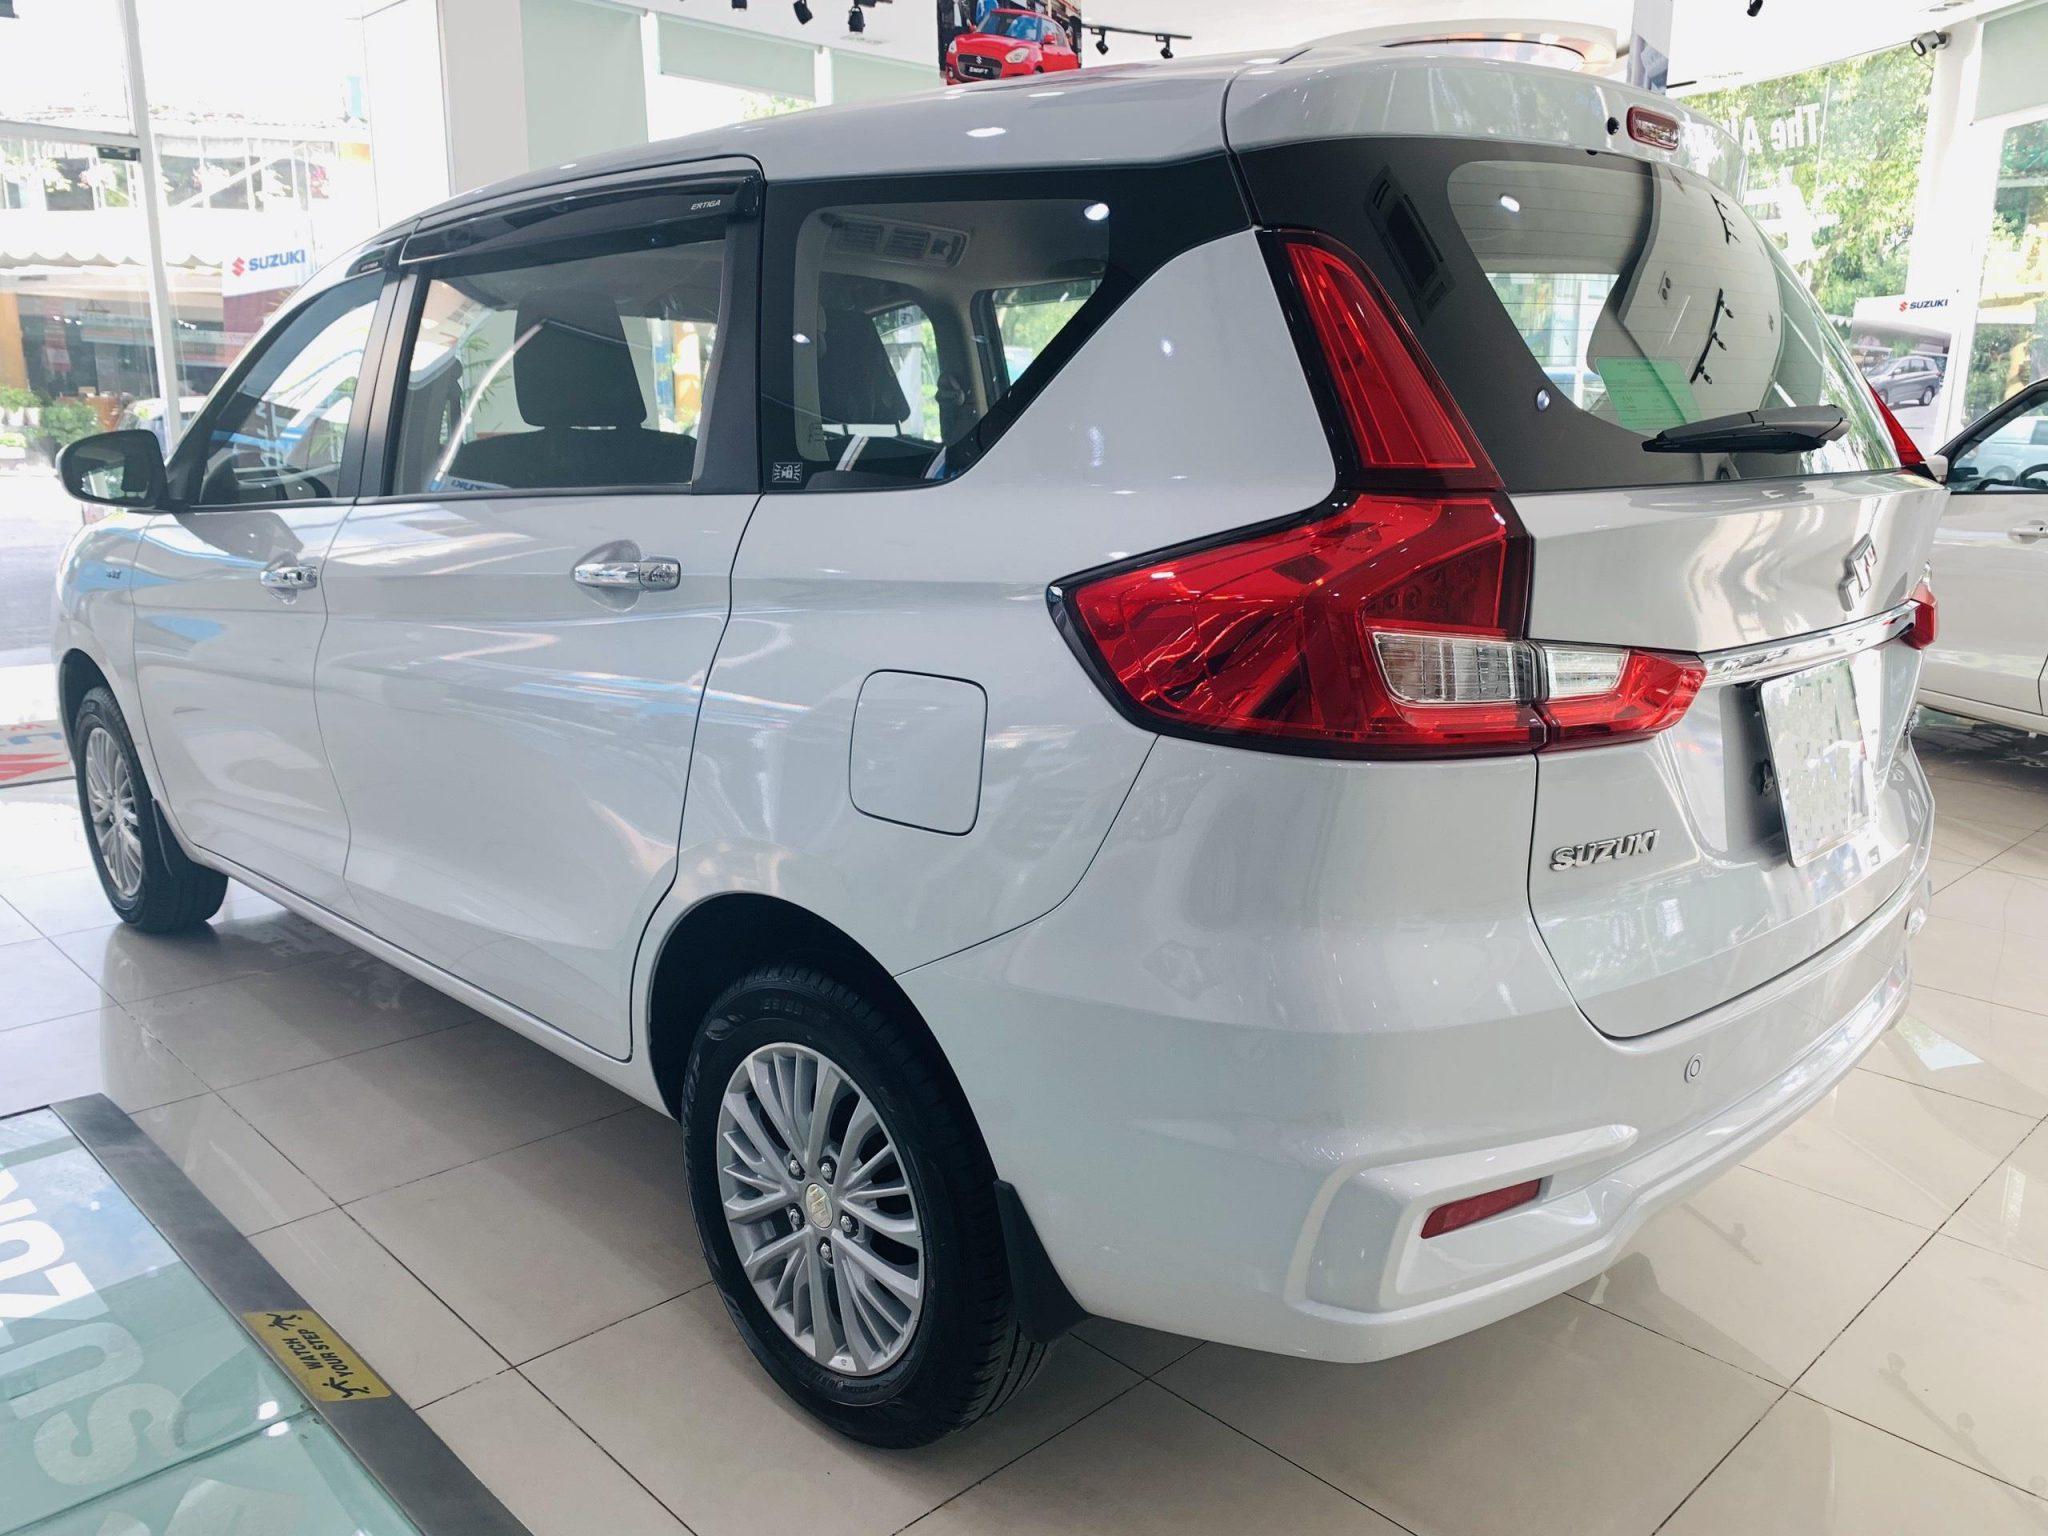 xe Suzuki Ertiga 2019 tai muaxegiabeo 18 - Suzuki Ertiga [hienthinam]: giá xe và khuyến mãi tháng [hienthithang]